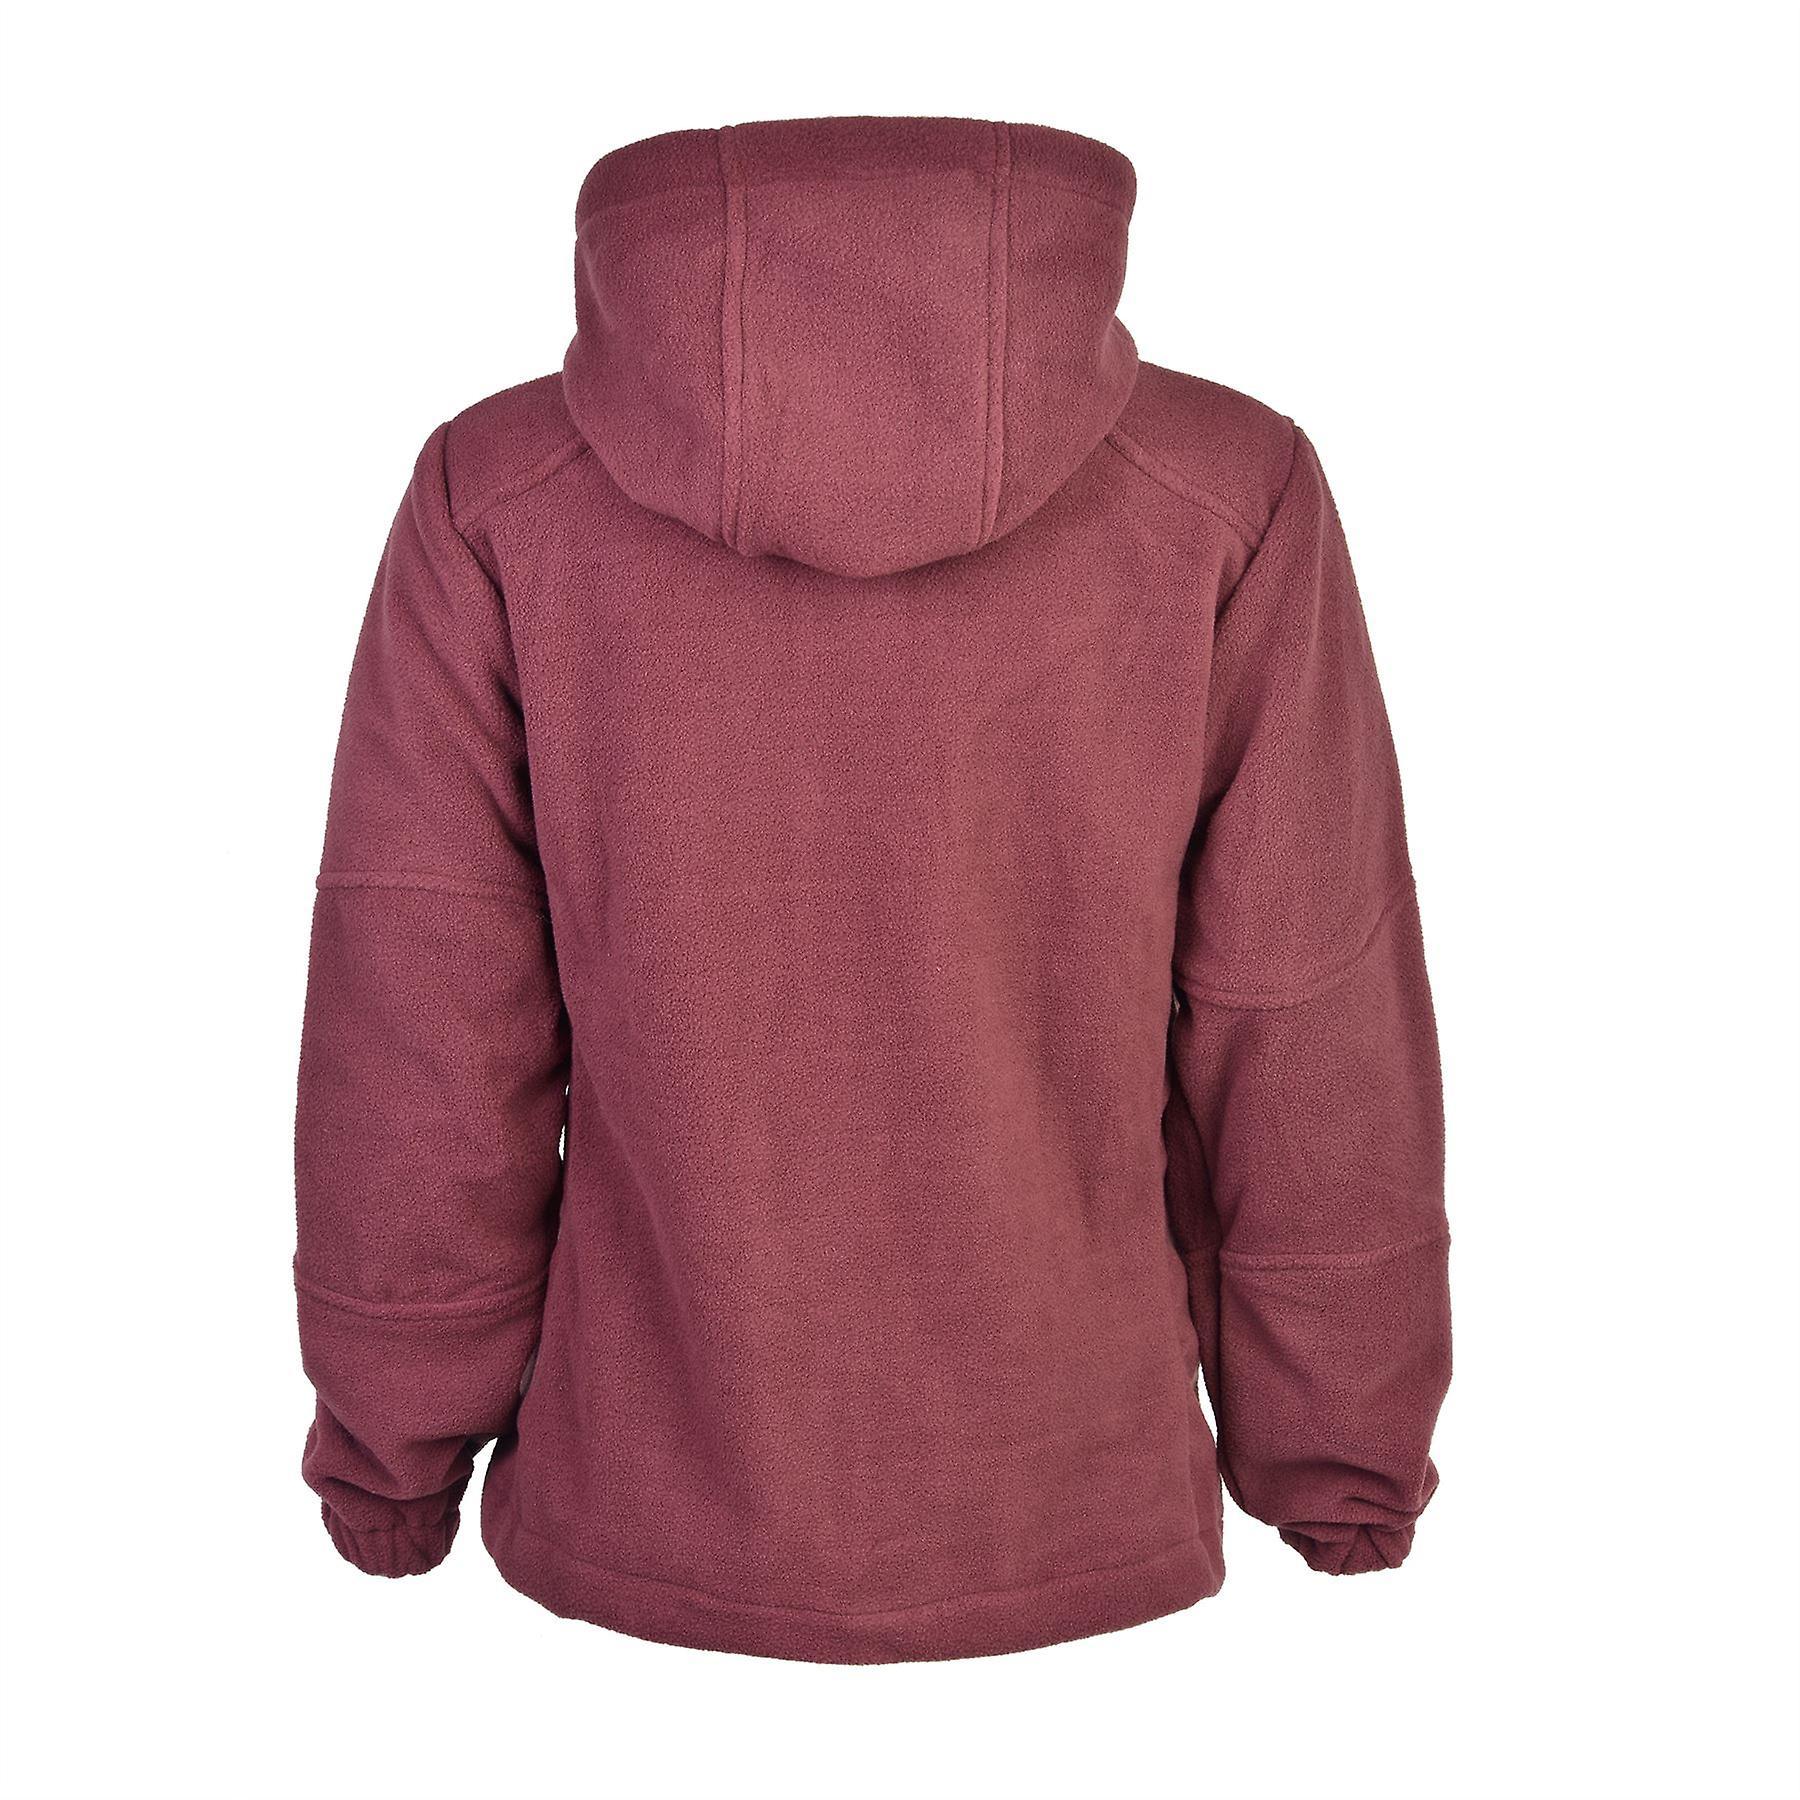 Slimbridge Grandola Size M Womens Fleece Jacket, Plum